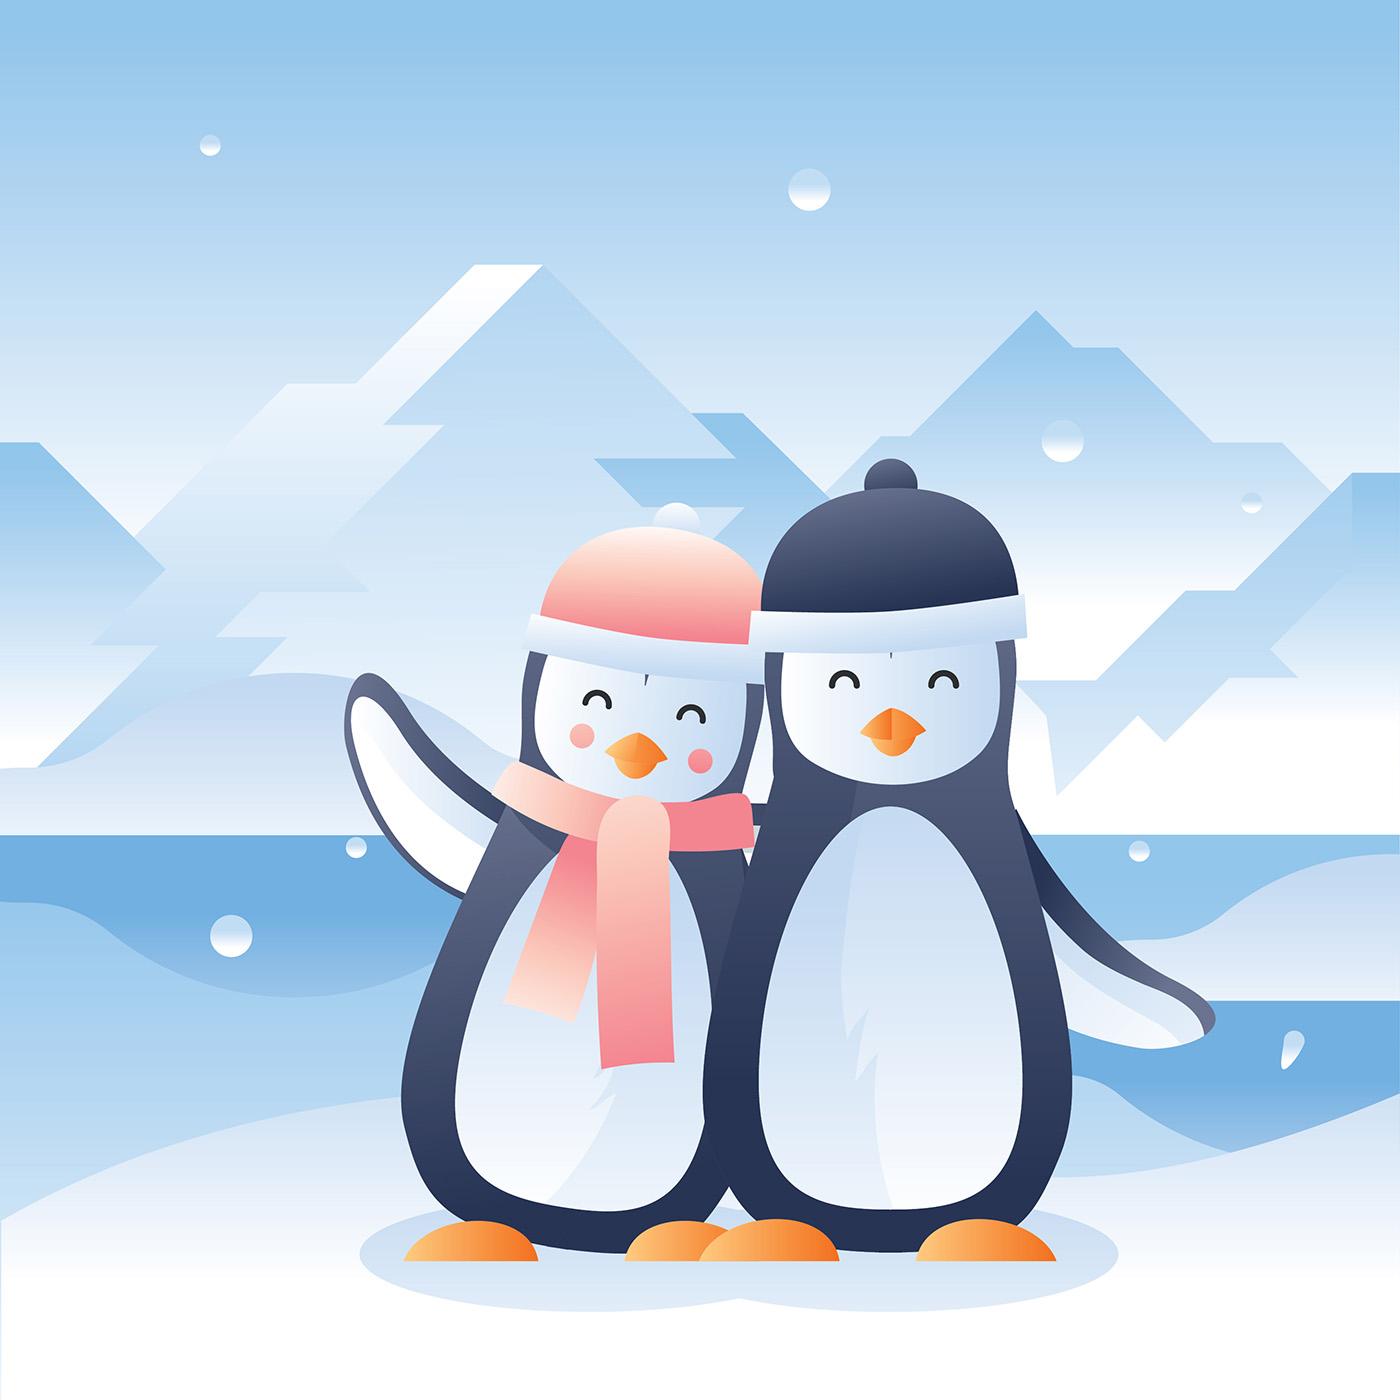 Cute Couple Kissing Wallpaper Download Penguins In Love Vector Download Free Vector Art Stock